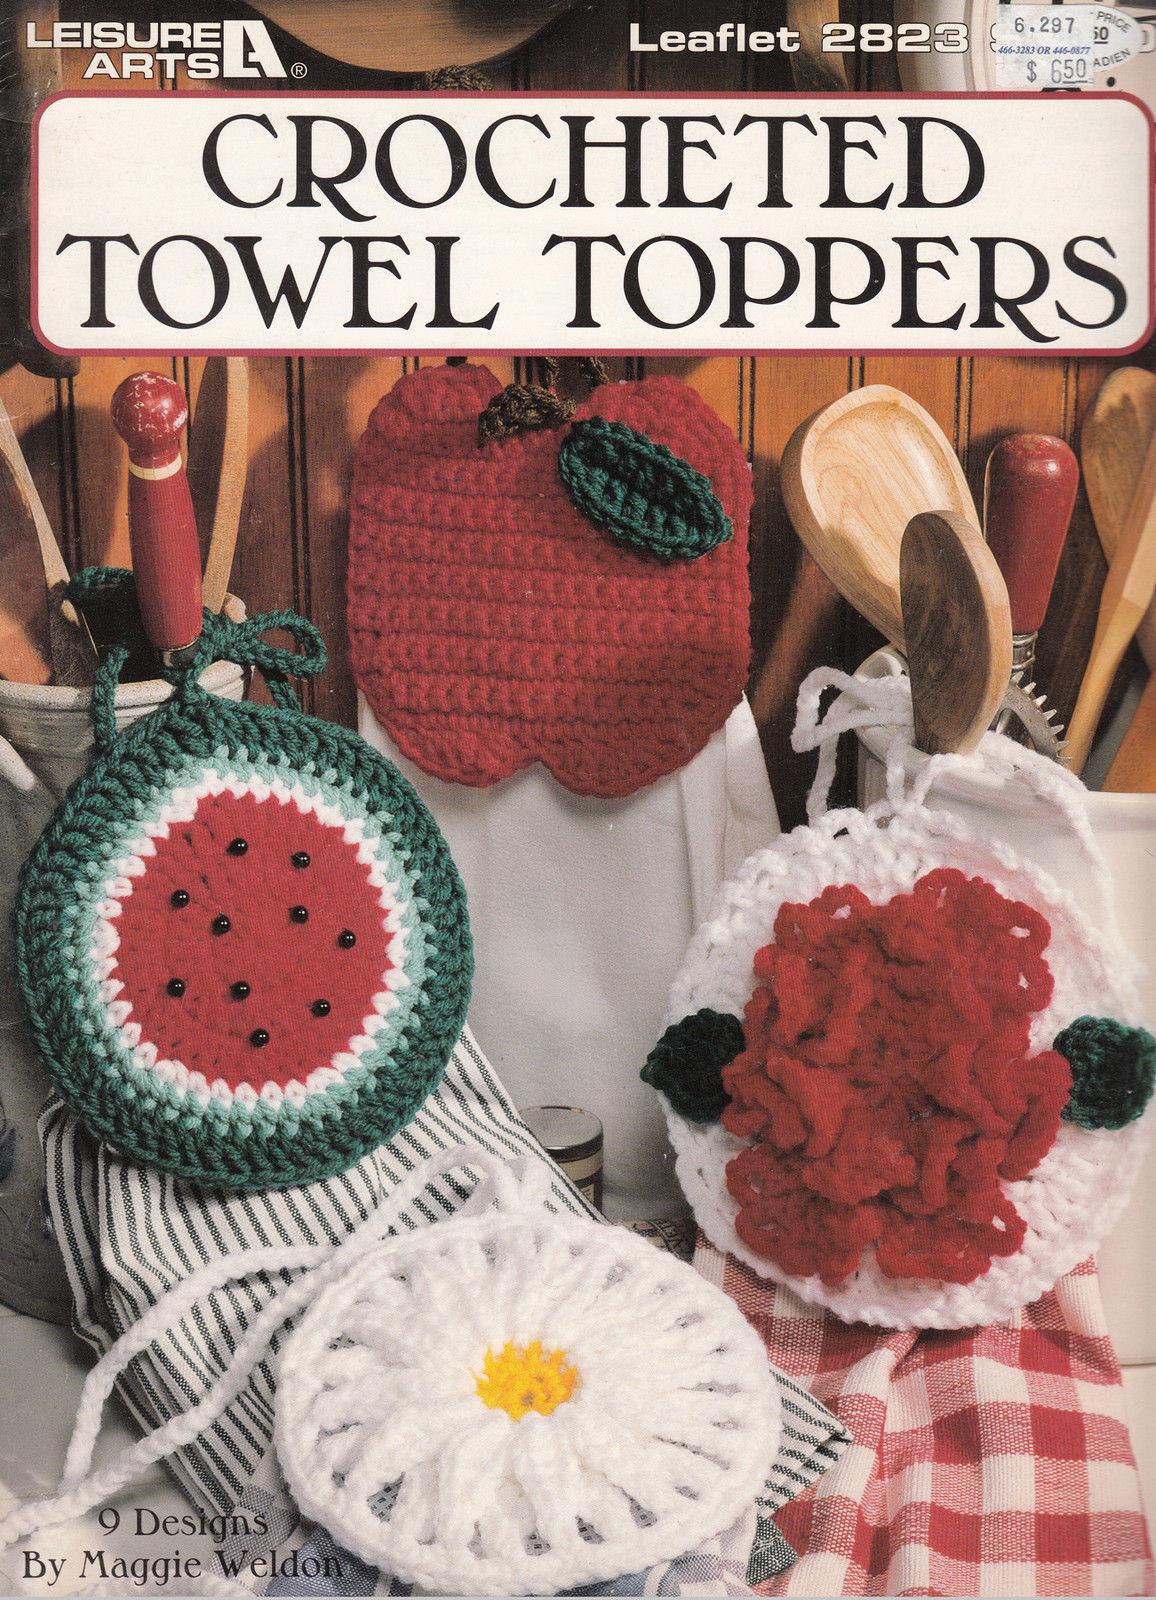 CROCHET TOWEL TOPPERS - FLOWERS & FRUIT! LEISURE ARTS 2823 - $8.98